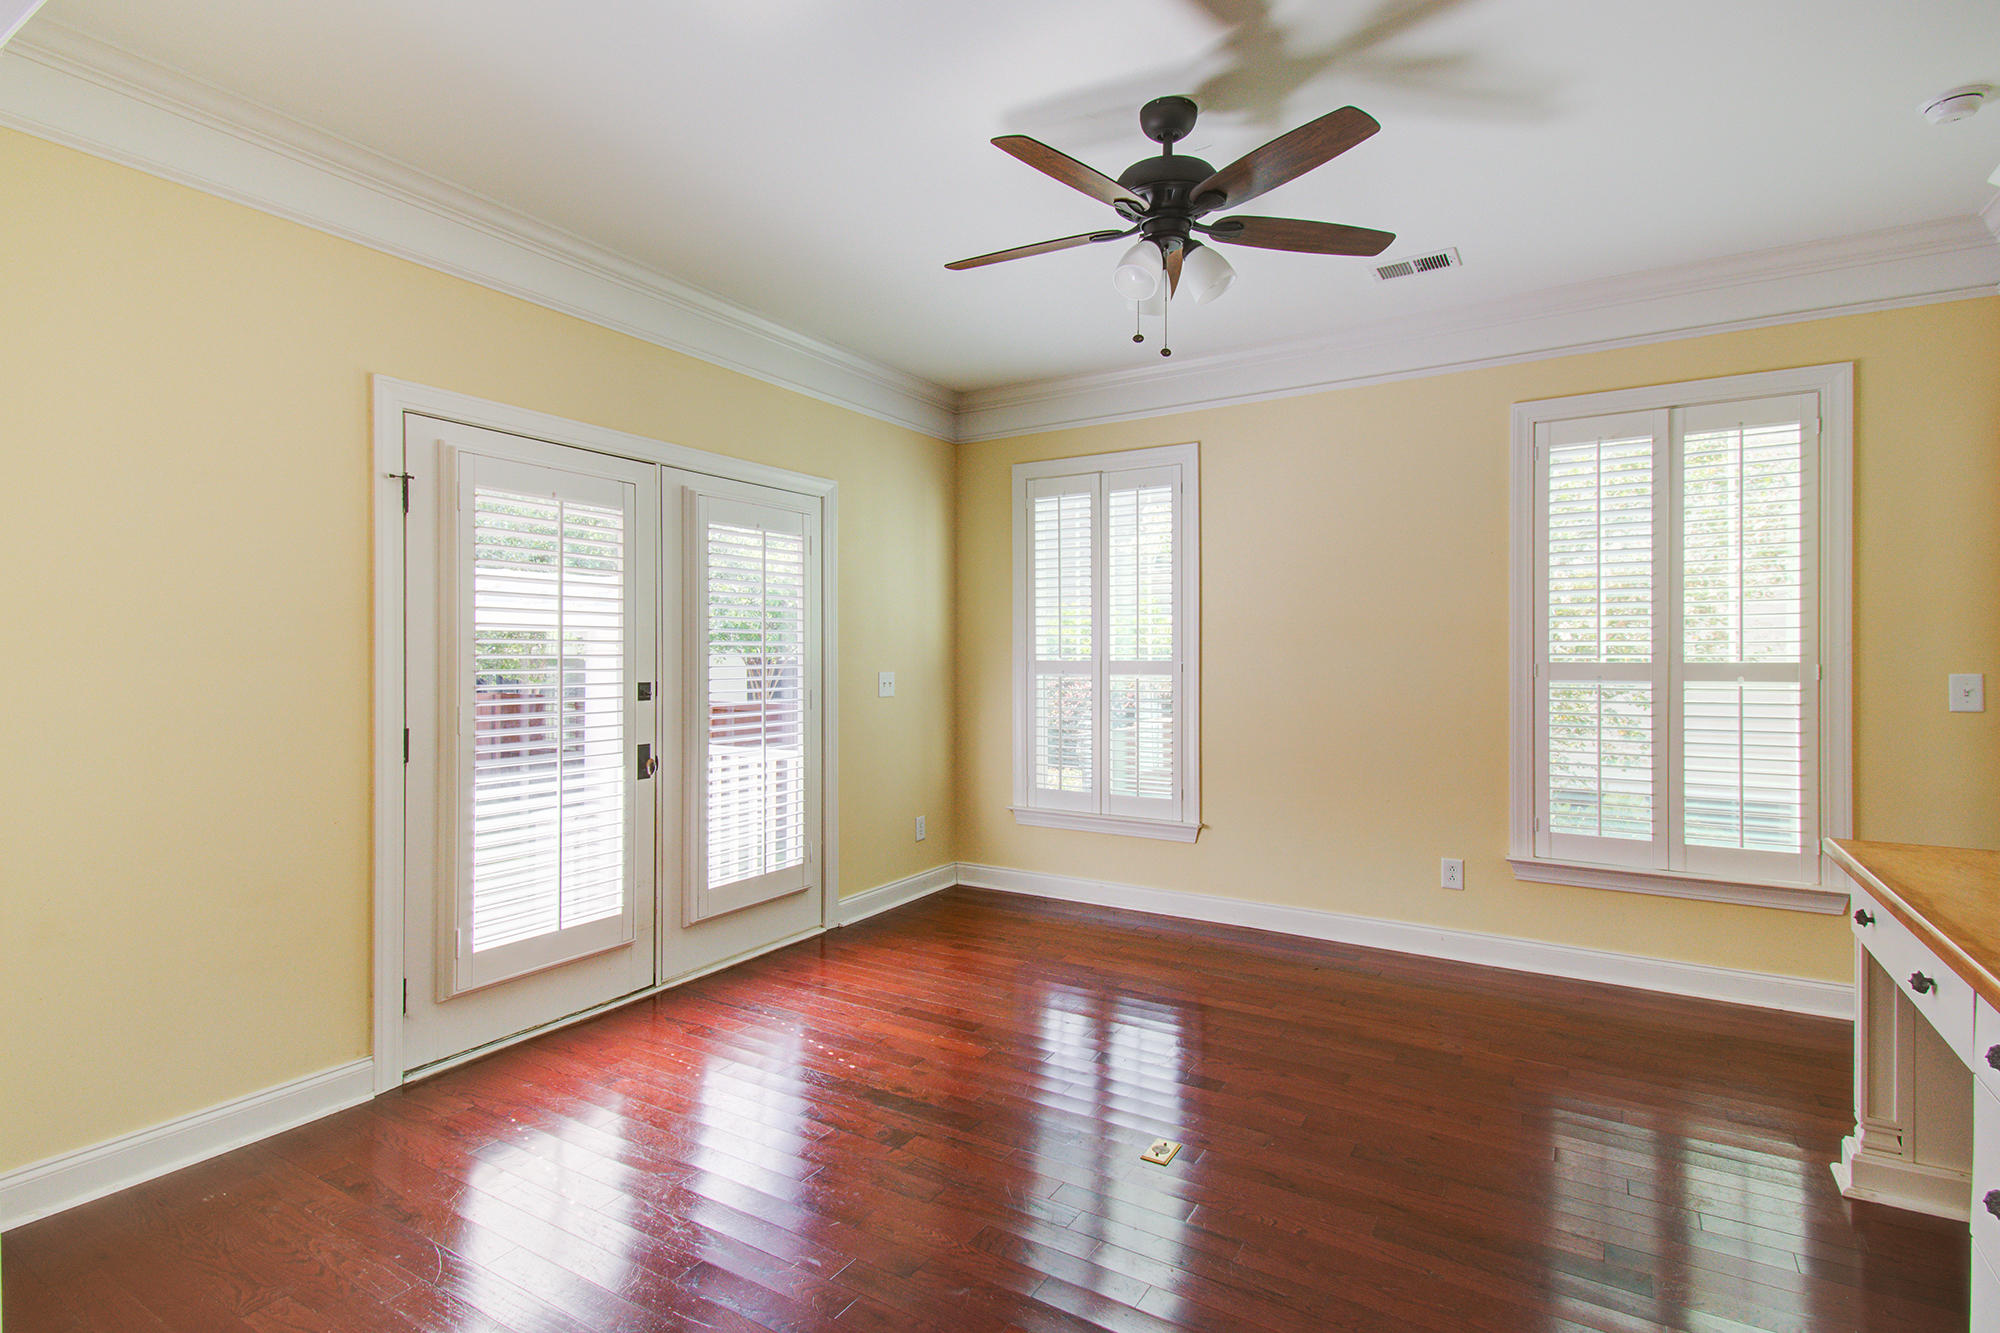 Center Park Homes For Sale - 950 Crossing, Daniel Island, SC - 11